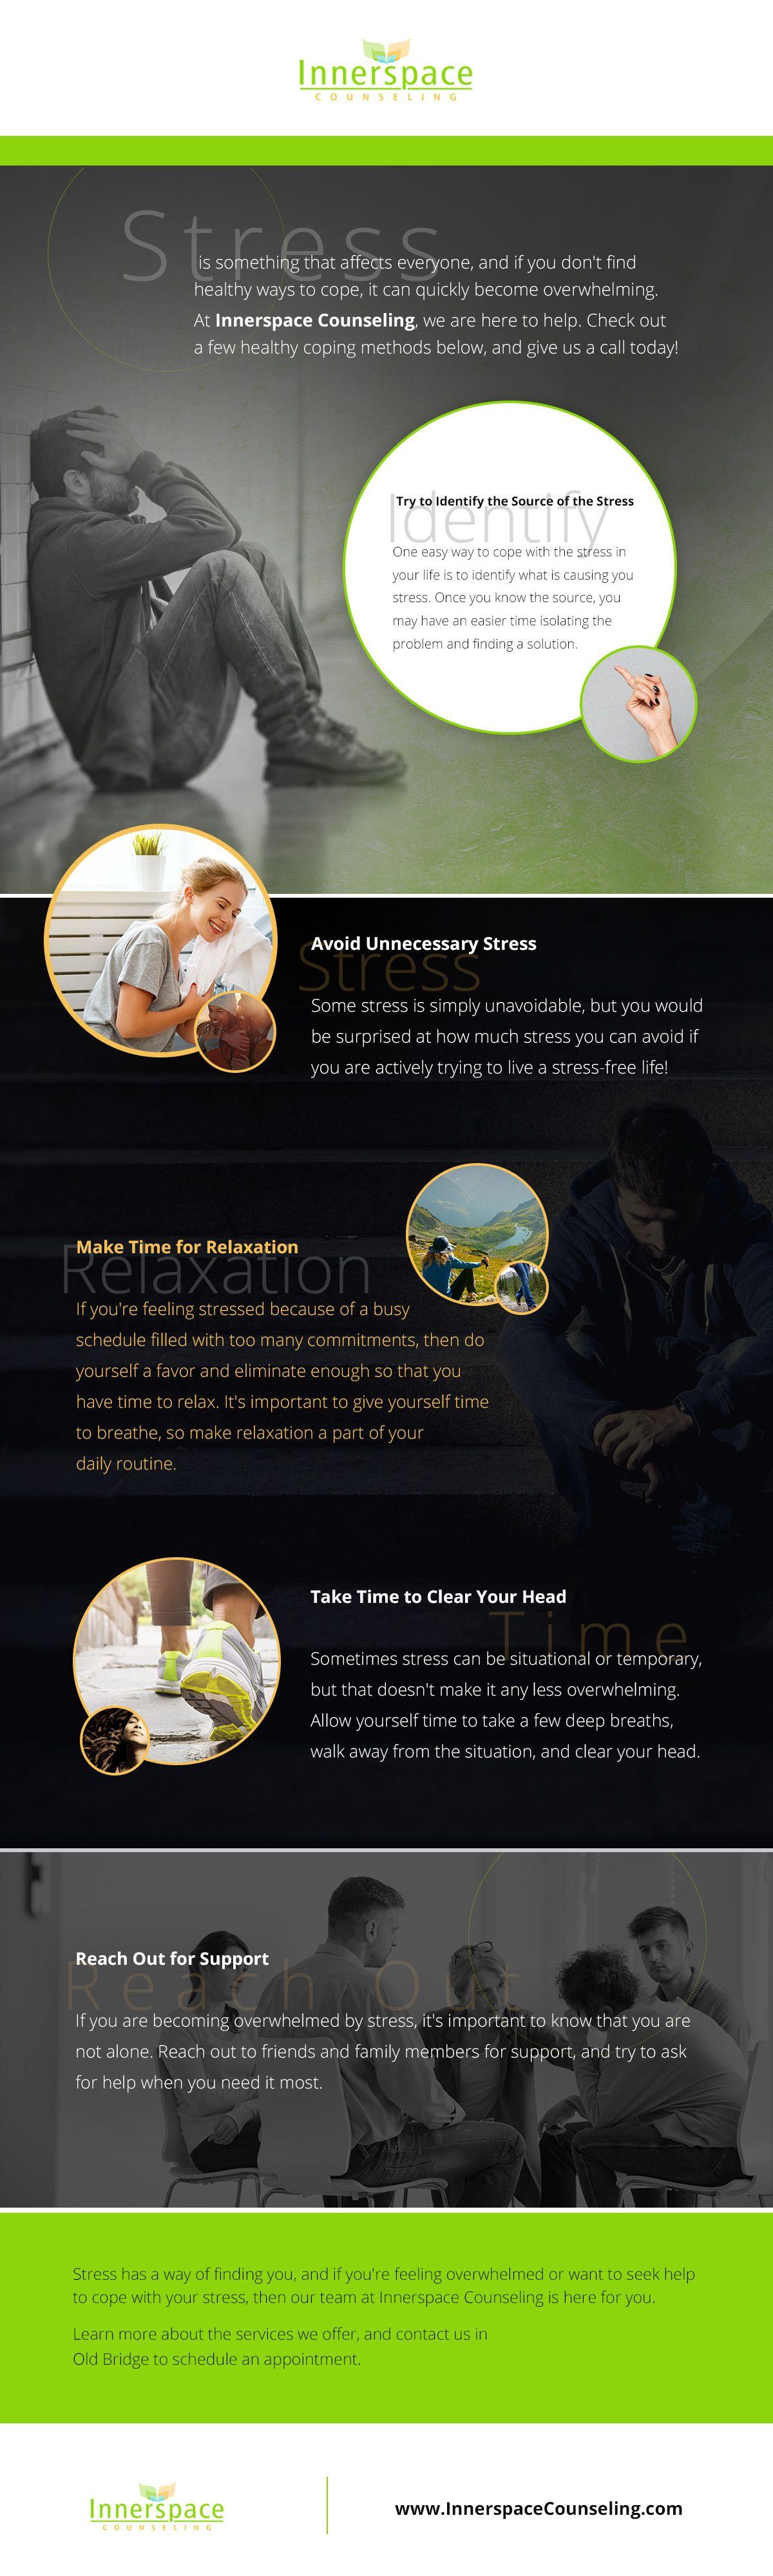 InnerspaceCounceling-Infographic-8-29-19-5d68083b8e340.jpg